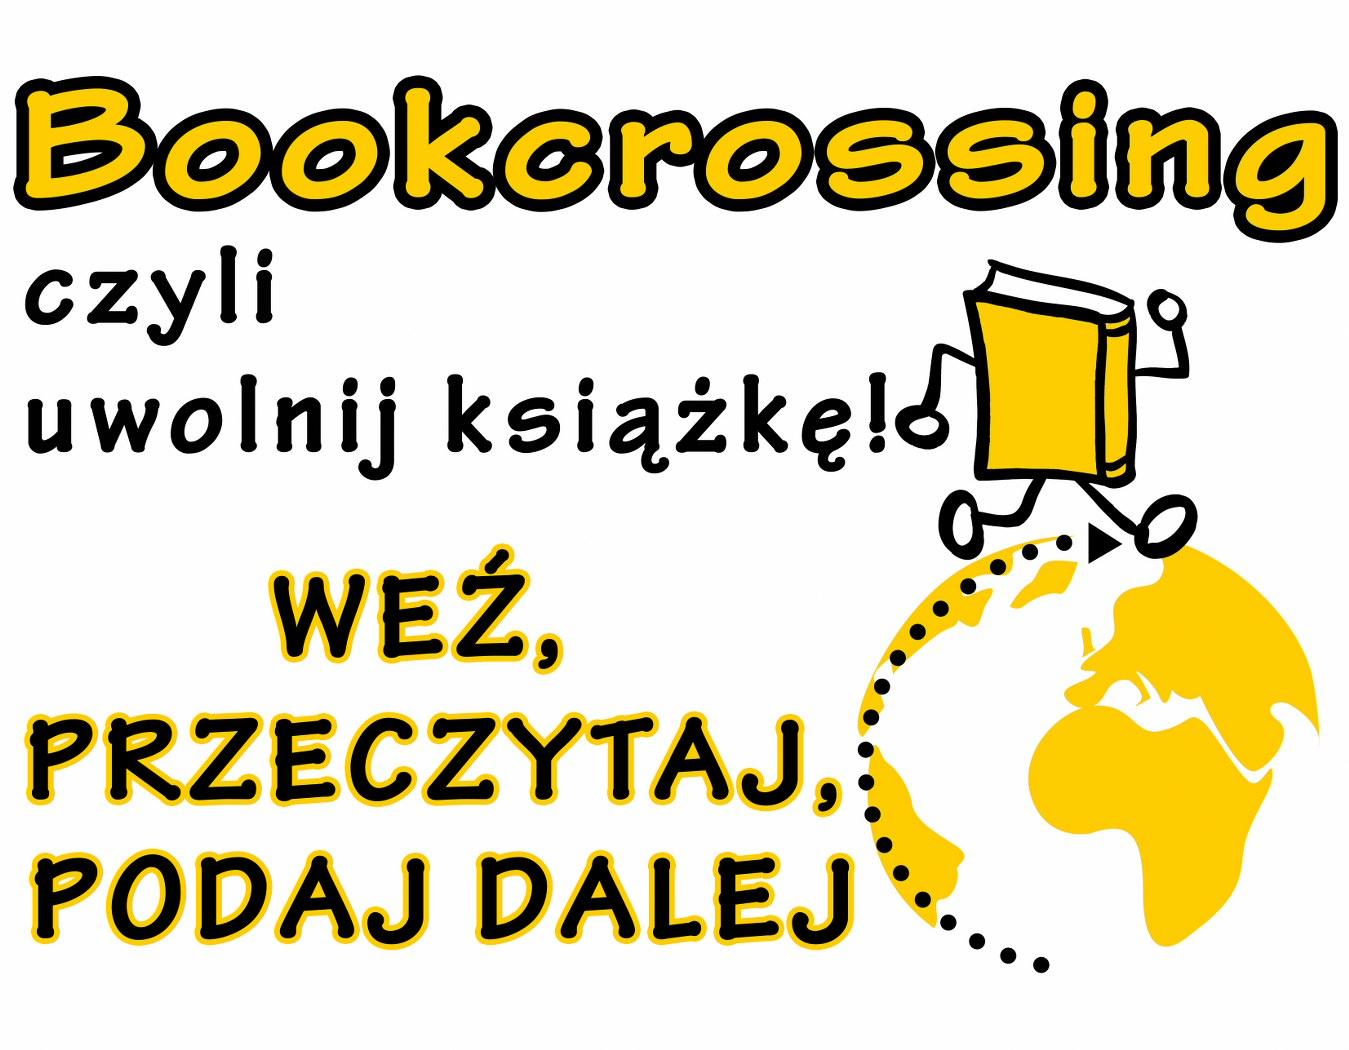 Bookcrossing_1349x1050